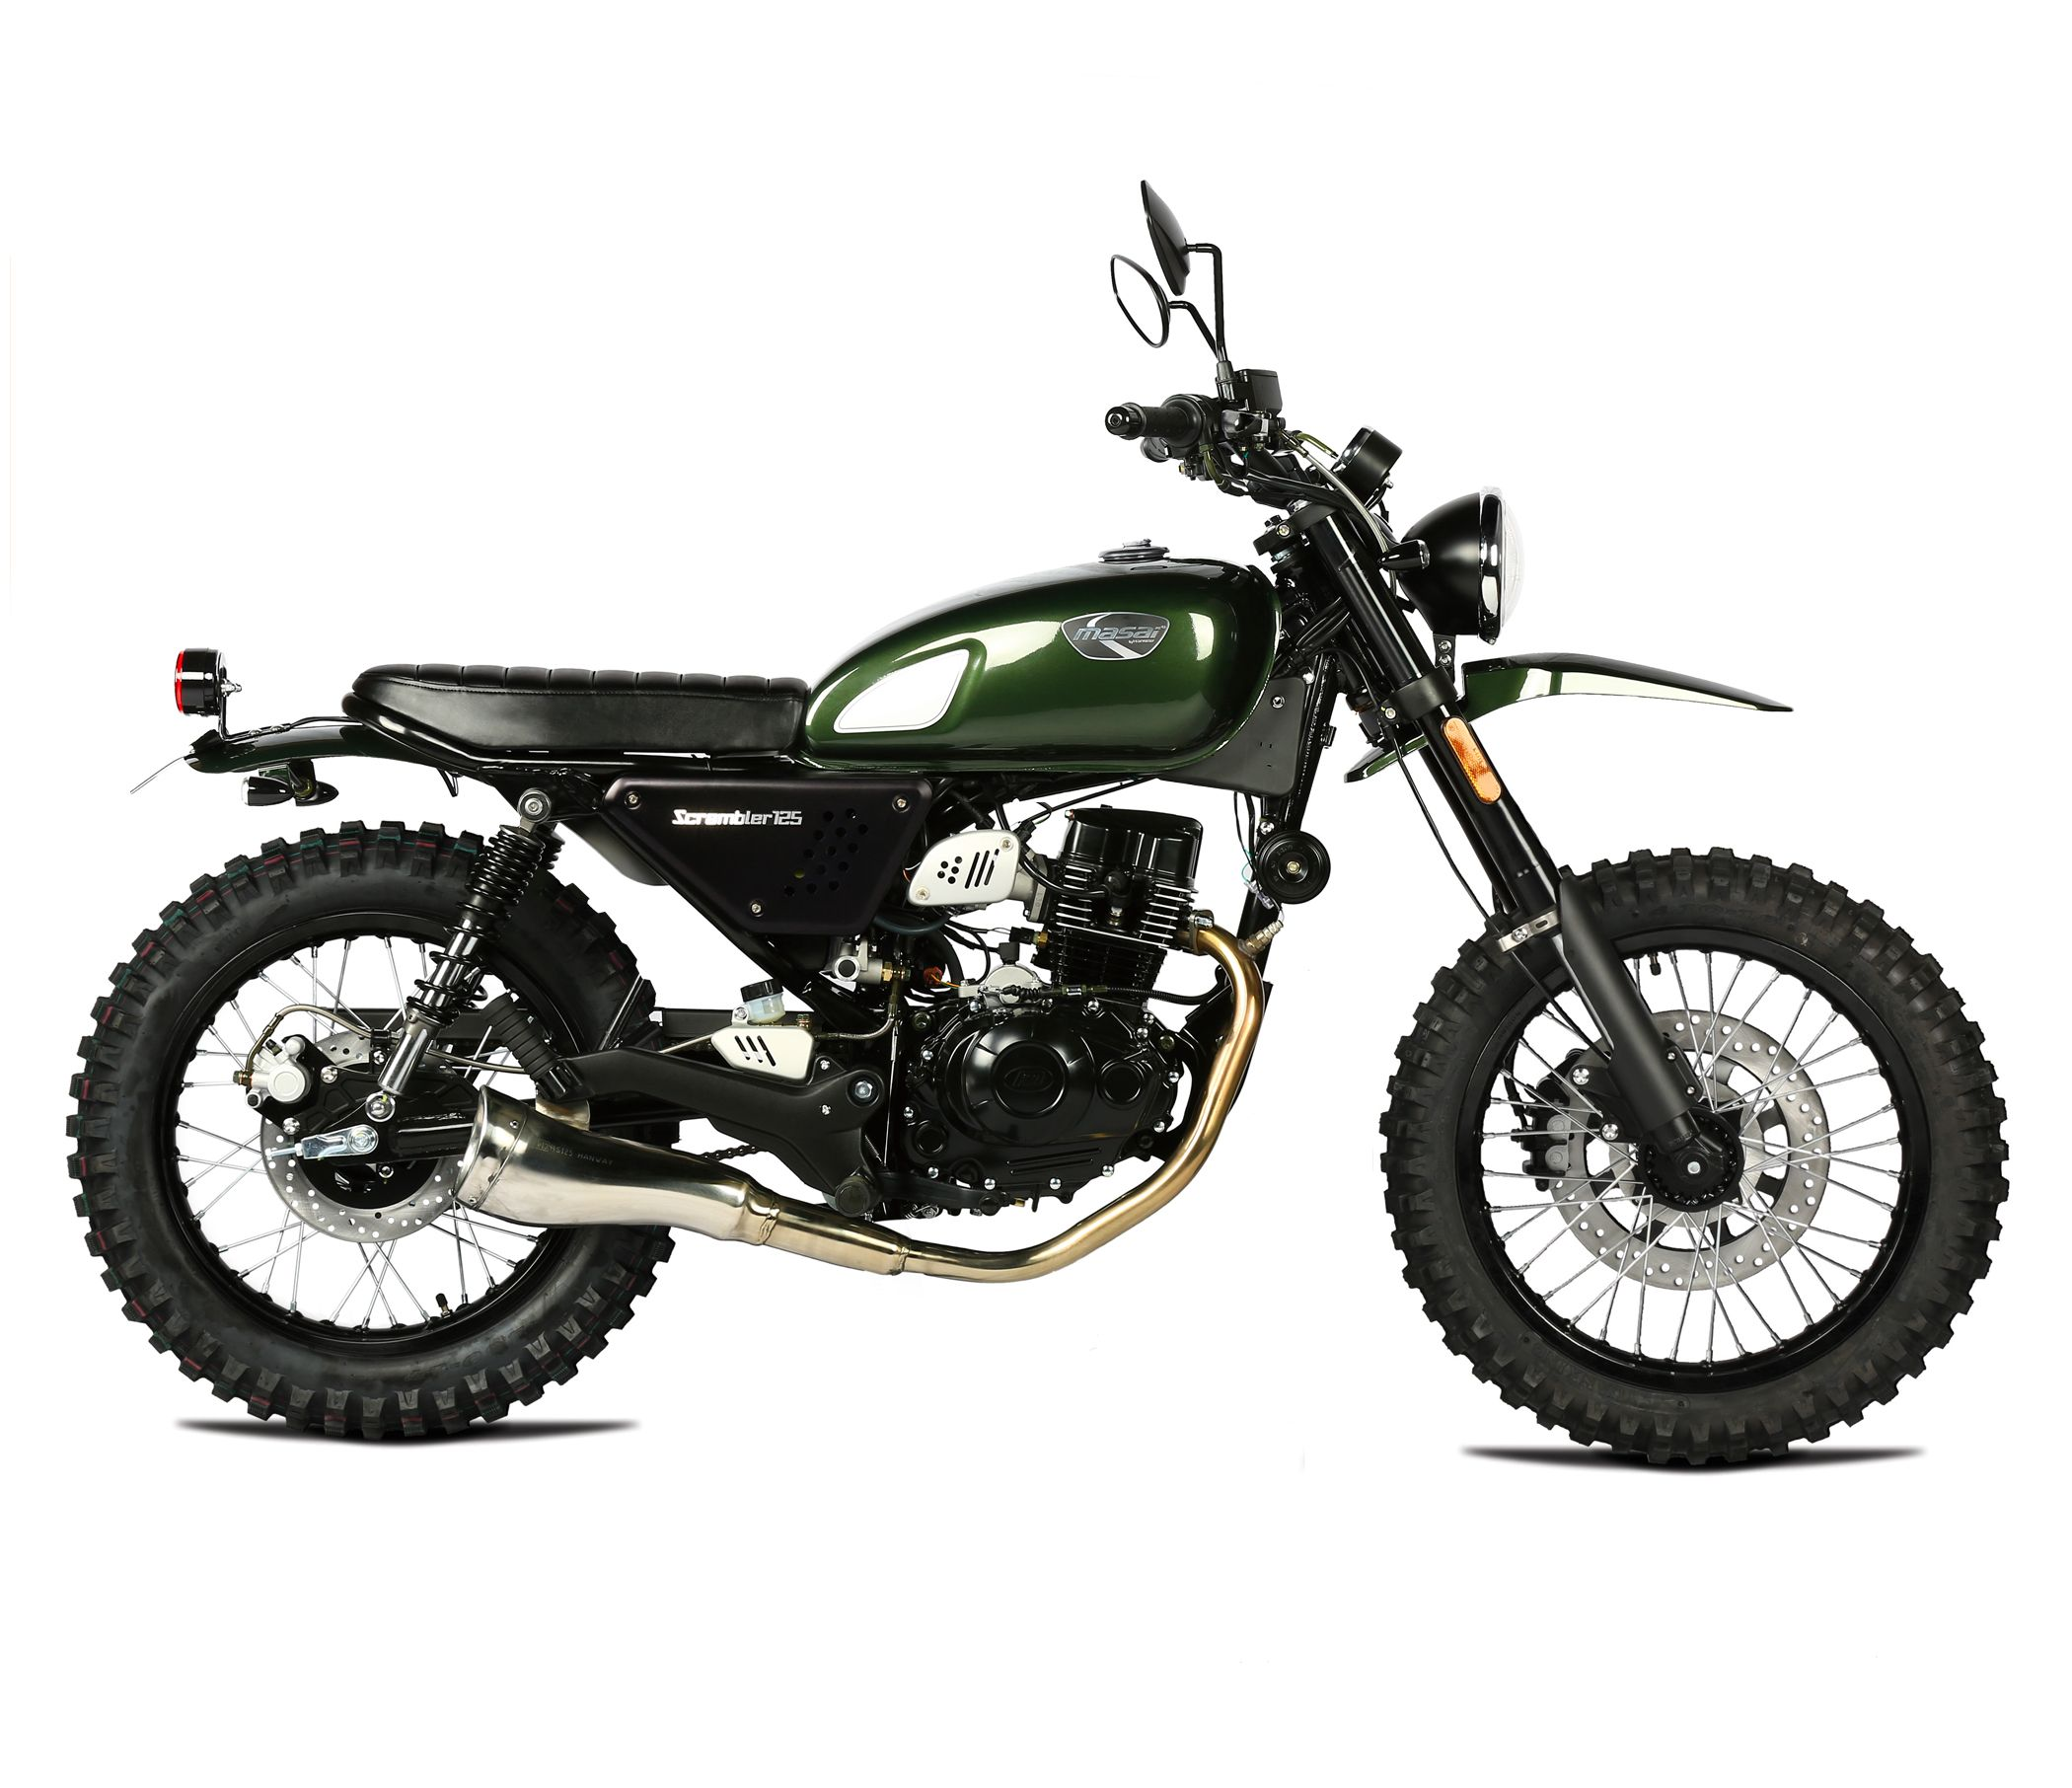 moto scrambler 125 euro 4 masai motos loisirs motos 125 pinterest moto scrambler moto et. Black Bedroom Furniture Sets. Home Design Ideas